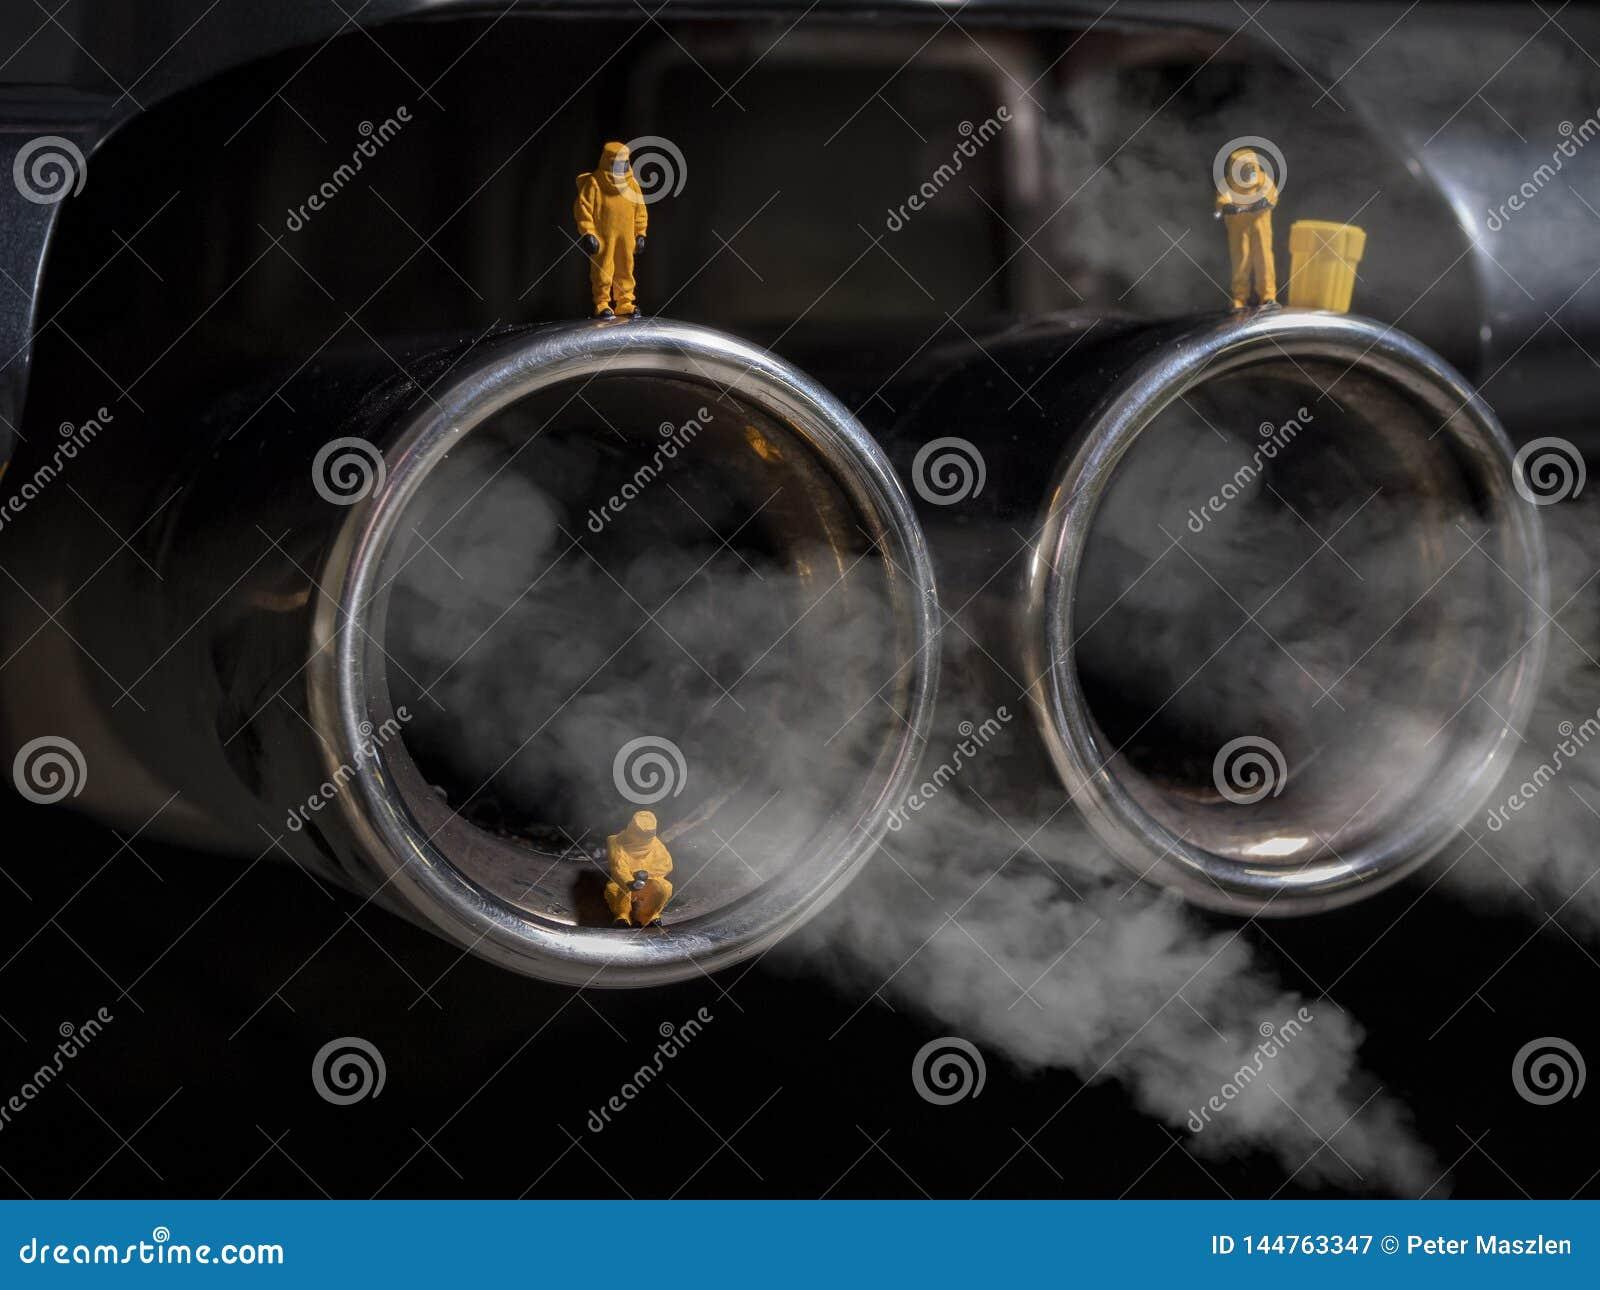 Miniature people examining car exhaust